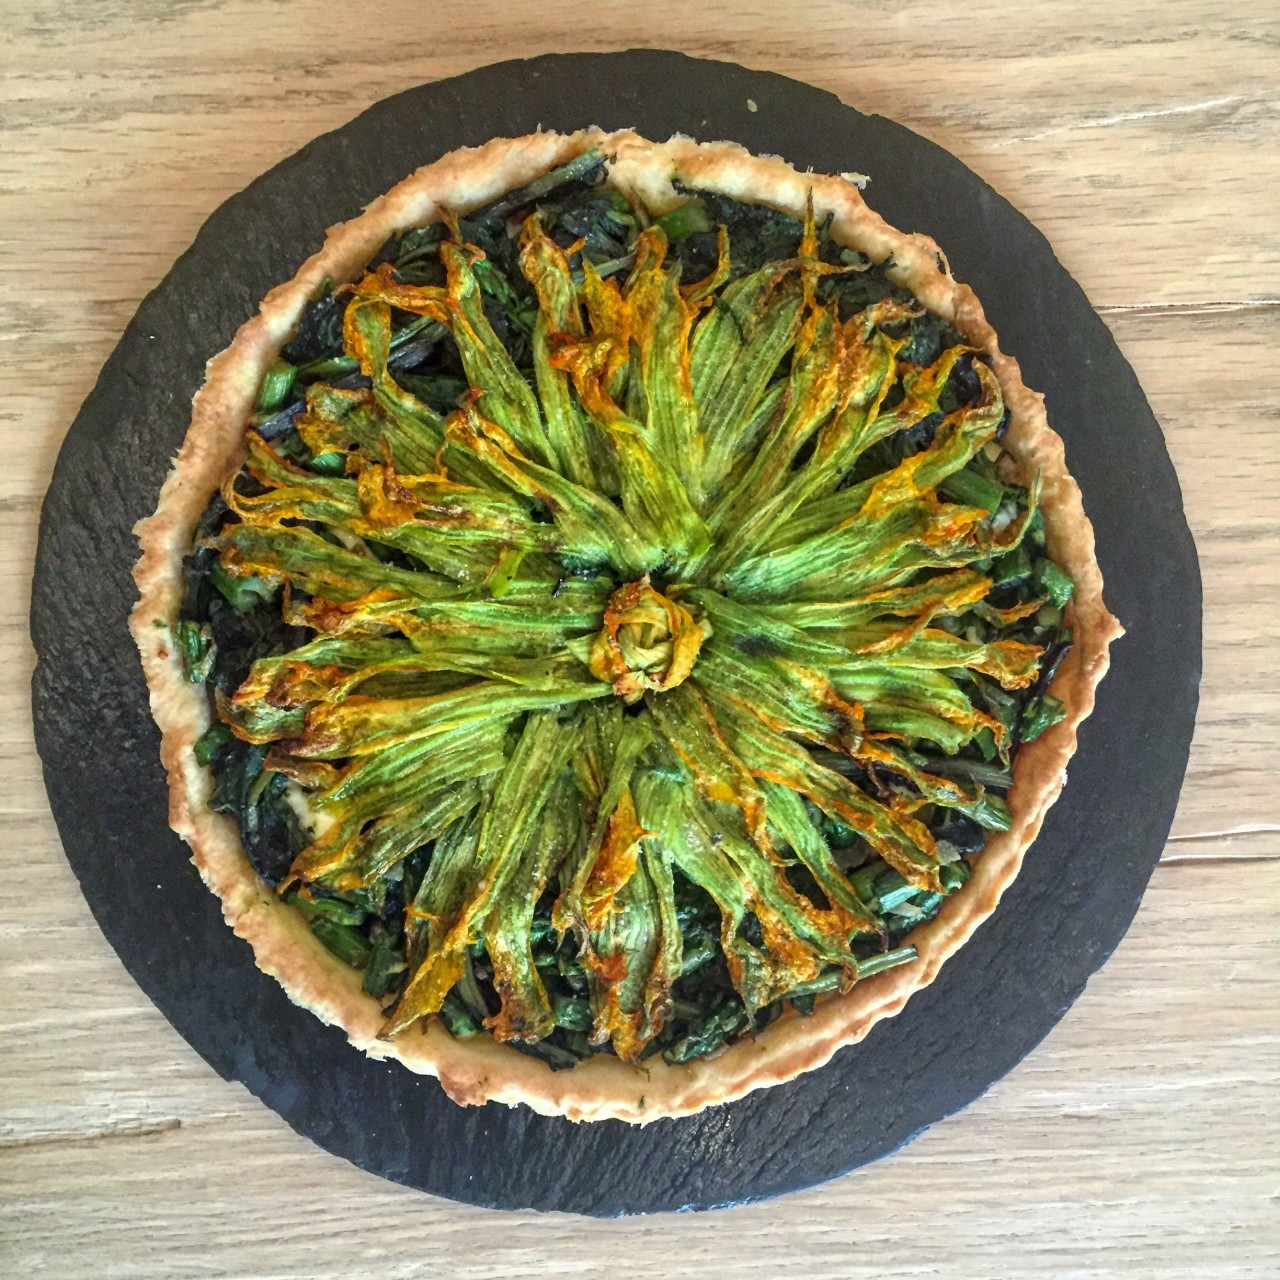 Torta salata con verdura e fiori di zucca